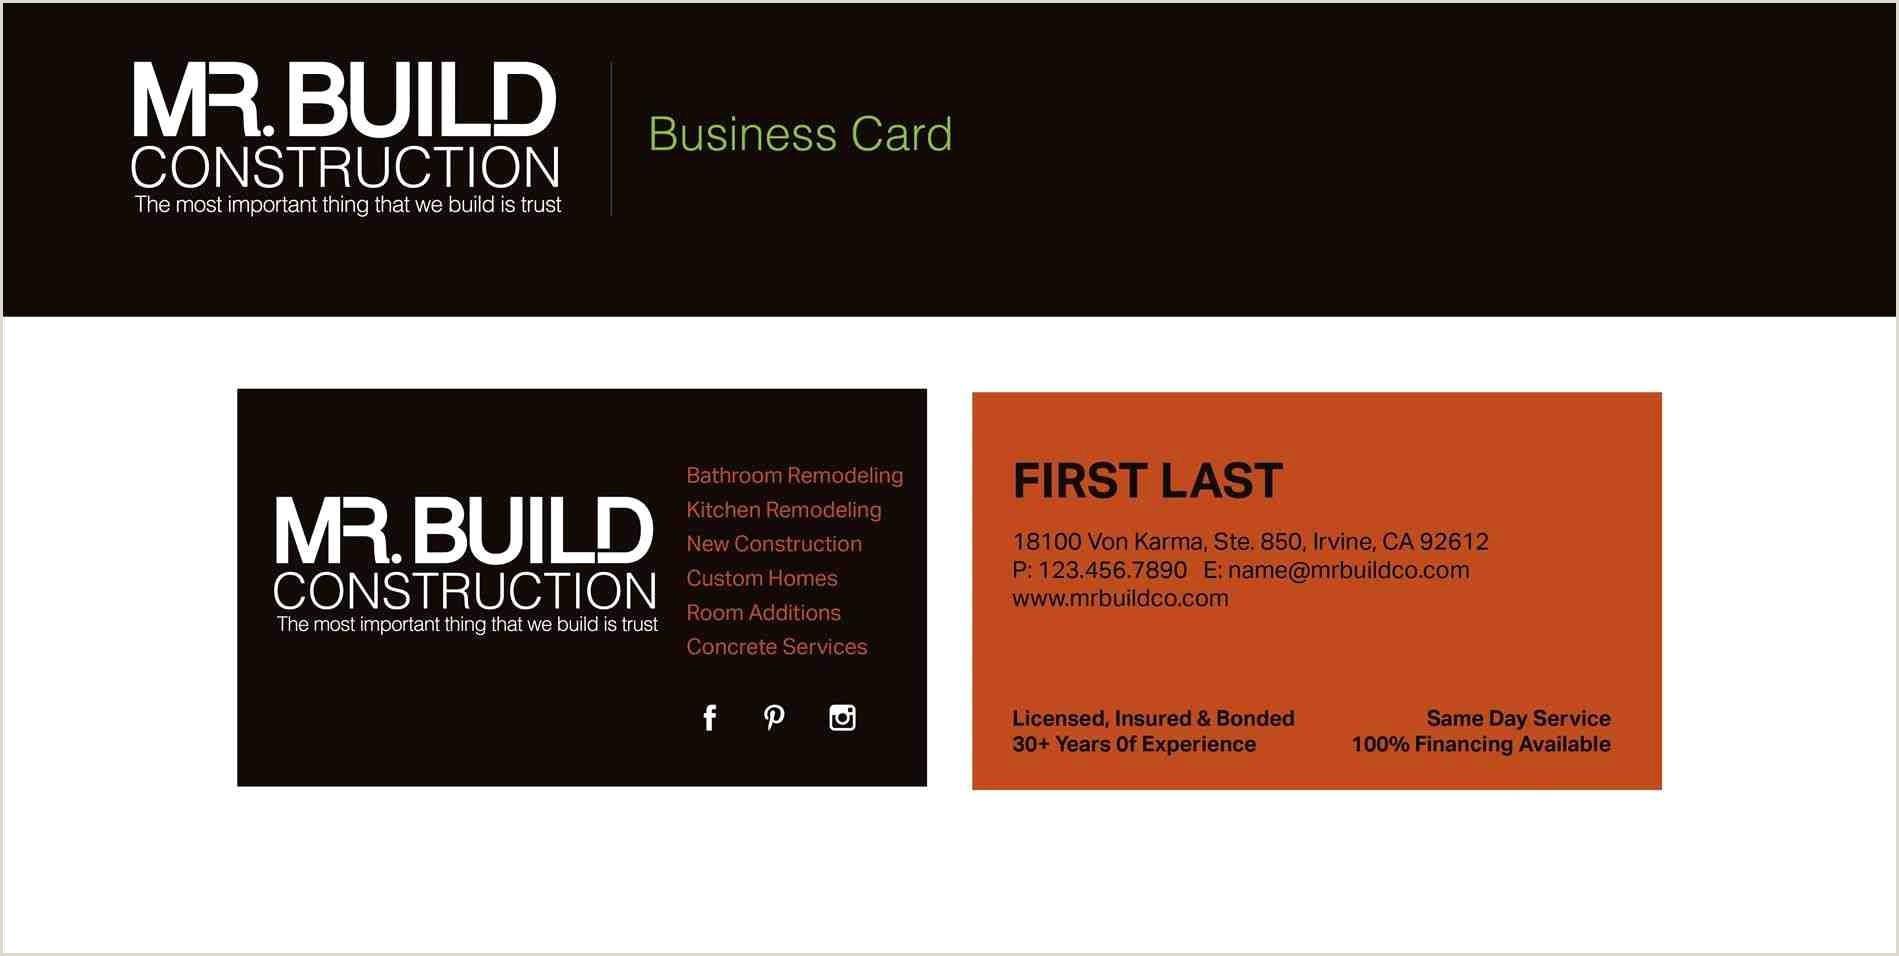 Best Business Cards For Image 14 Popular Hardwood Flooring Business Card Template